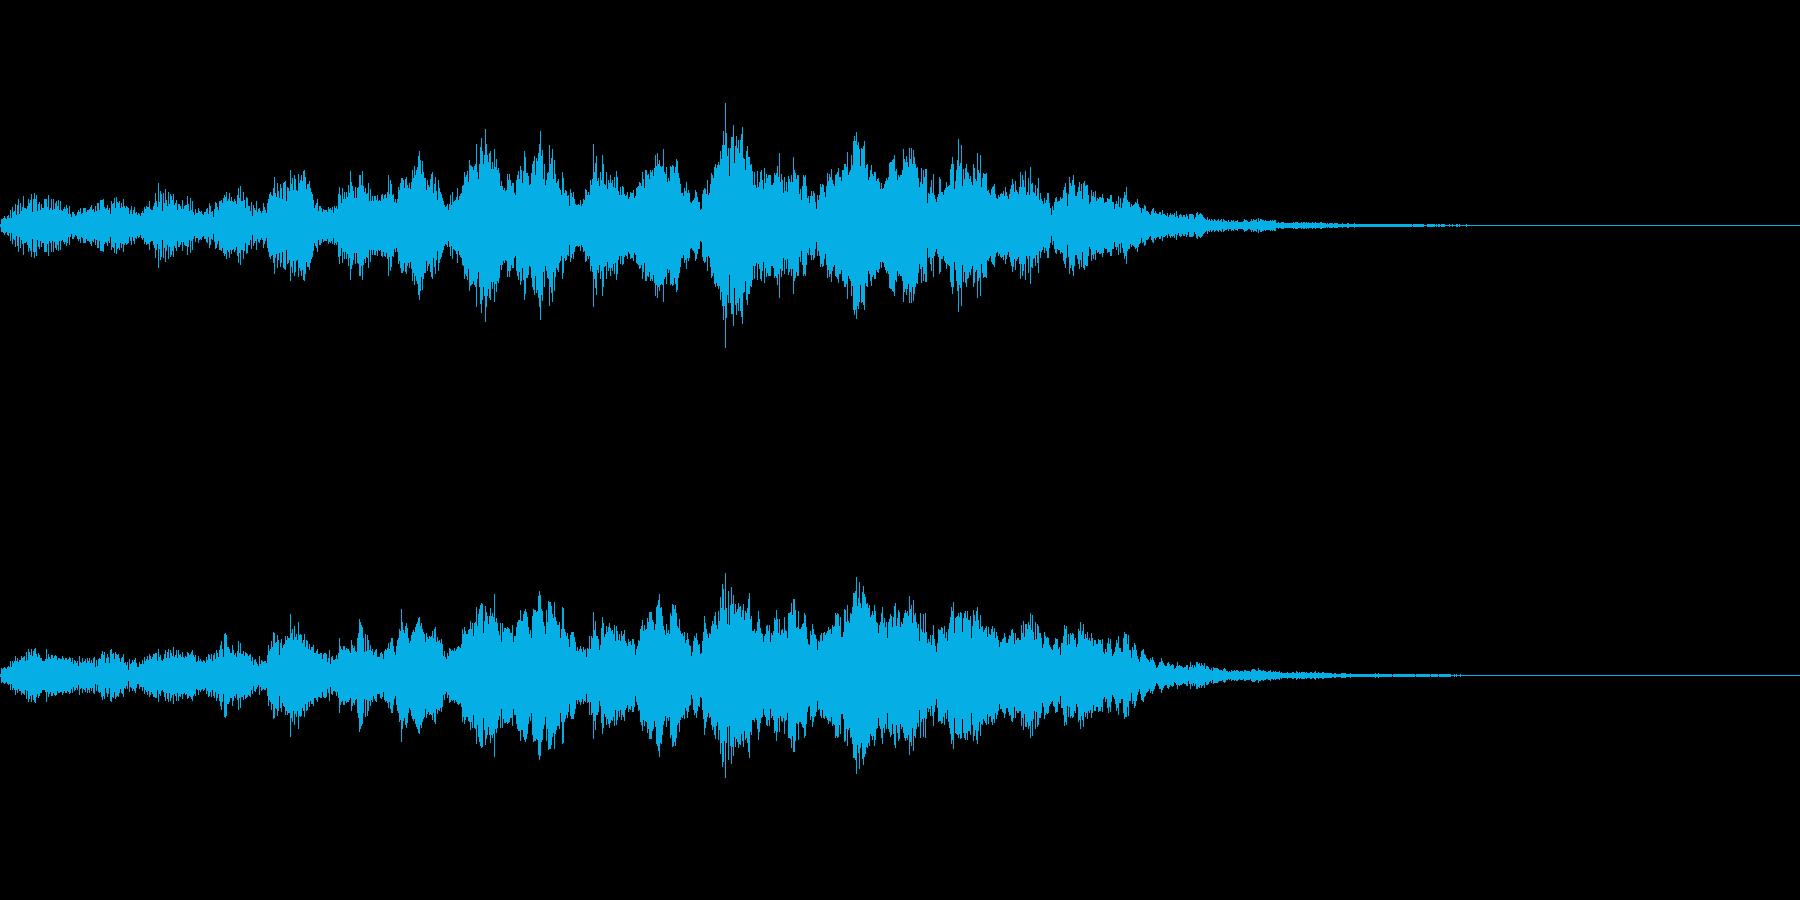 【SE 効果音】奇妙な音4の再生済みの波形